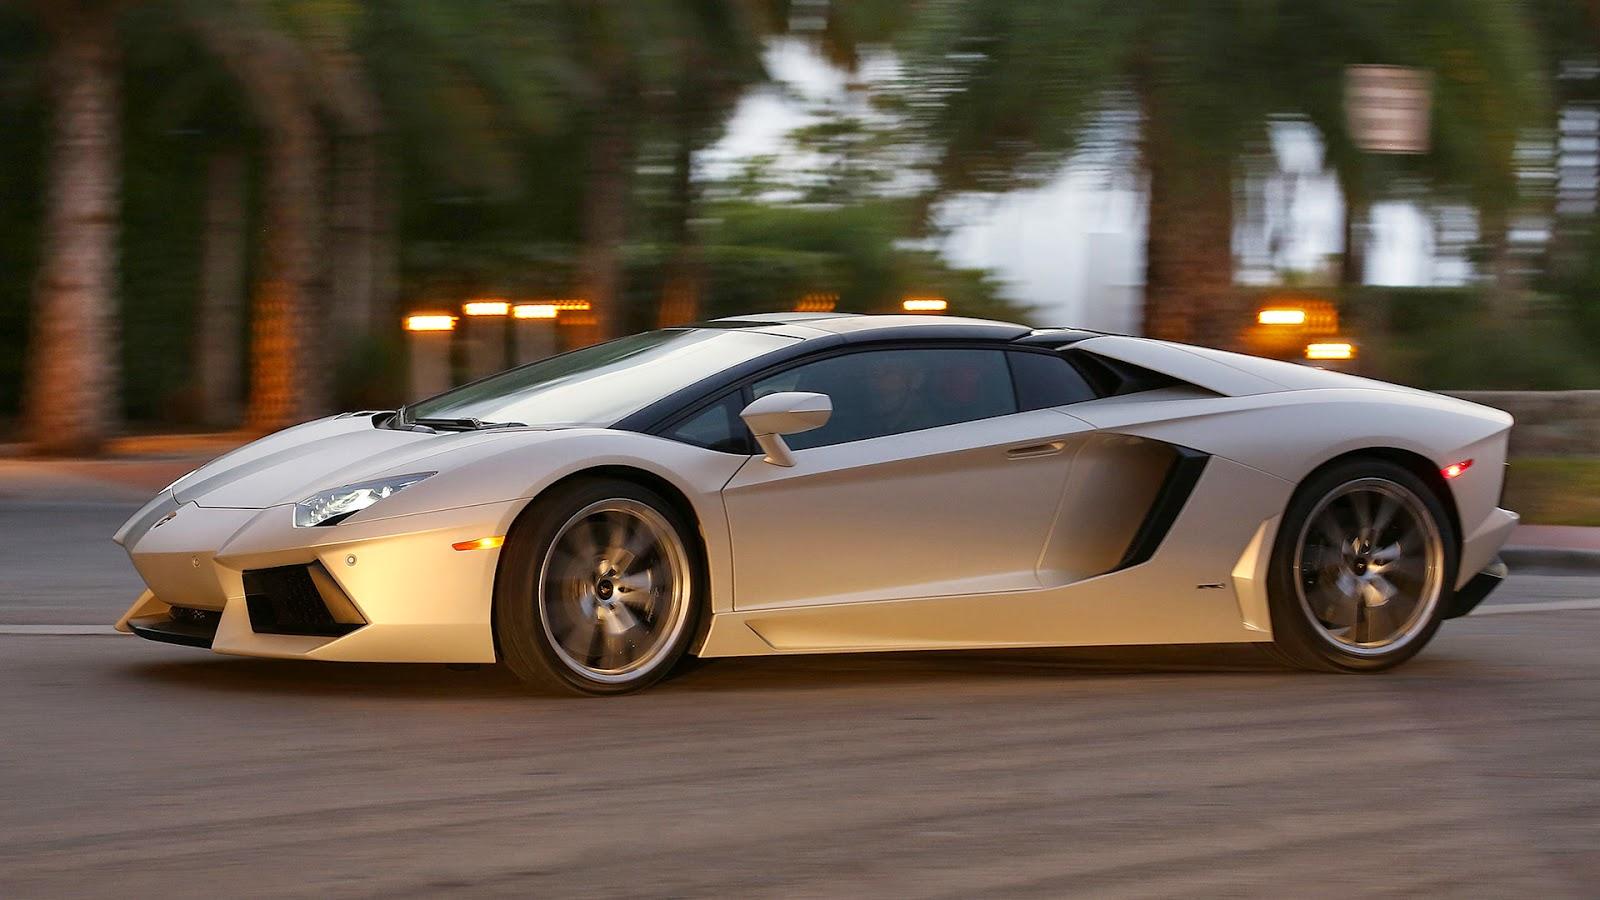 Lamborghini Aventador LP700-4 Roadster 2013 HD Car ...